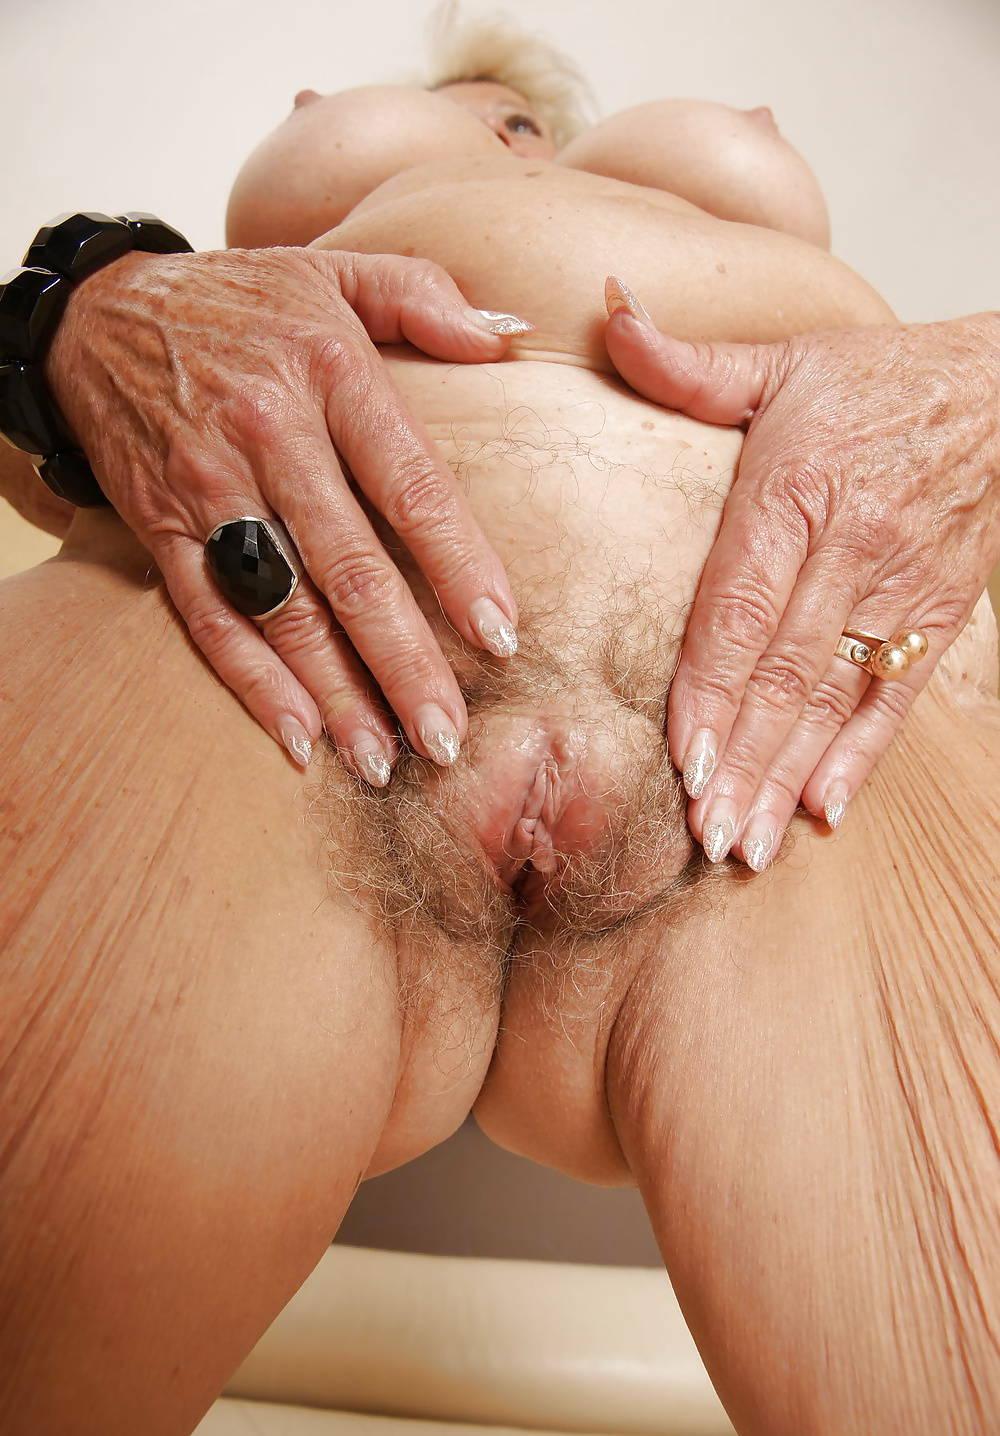 Порно на тел старая пизда